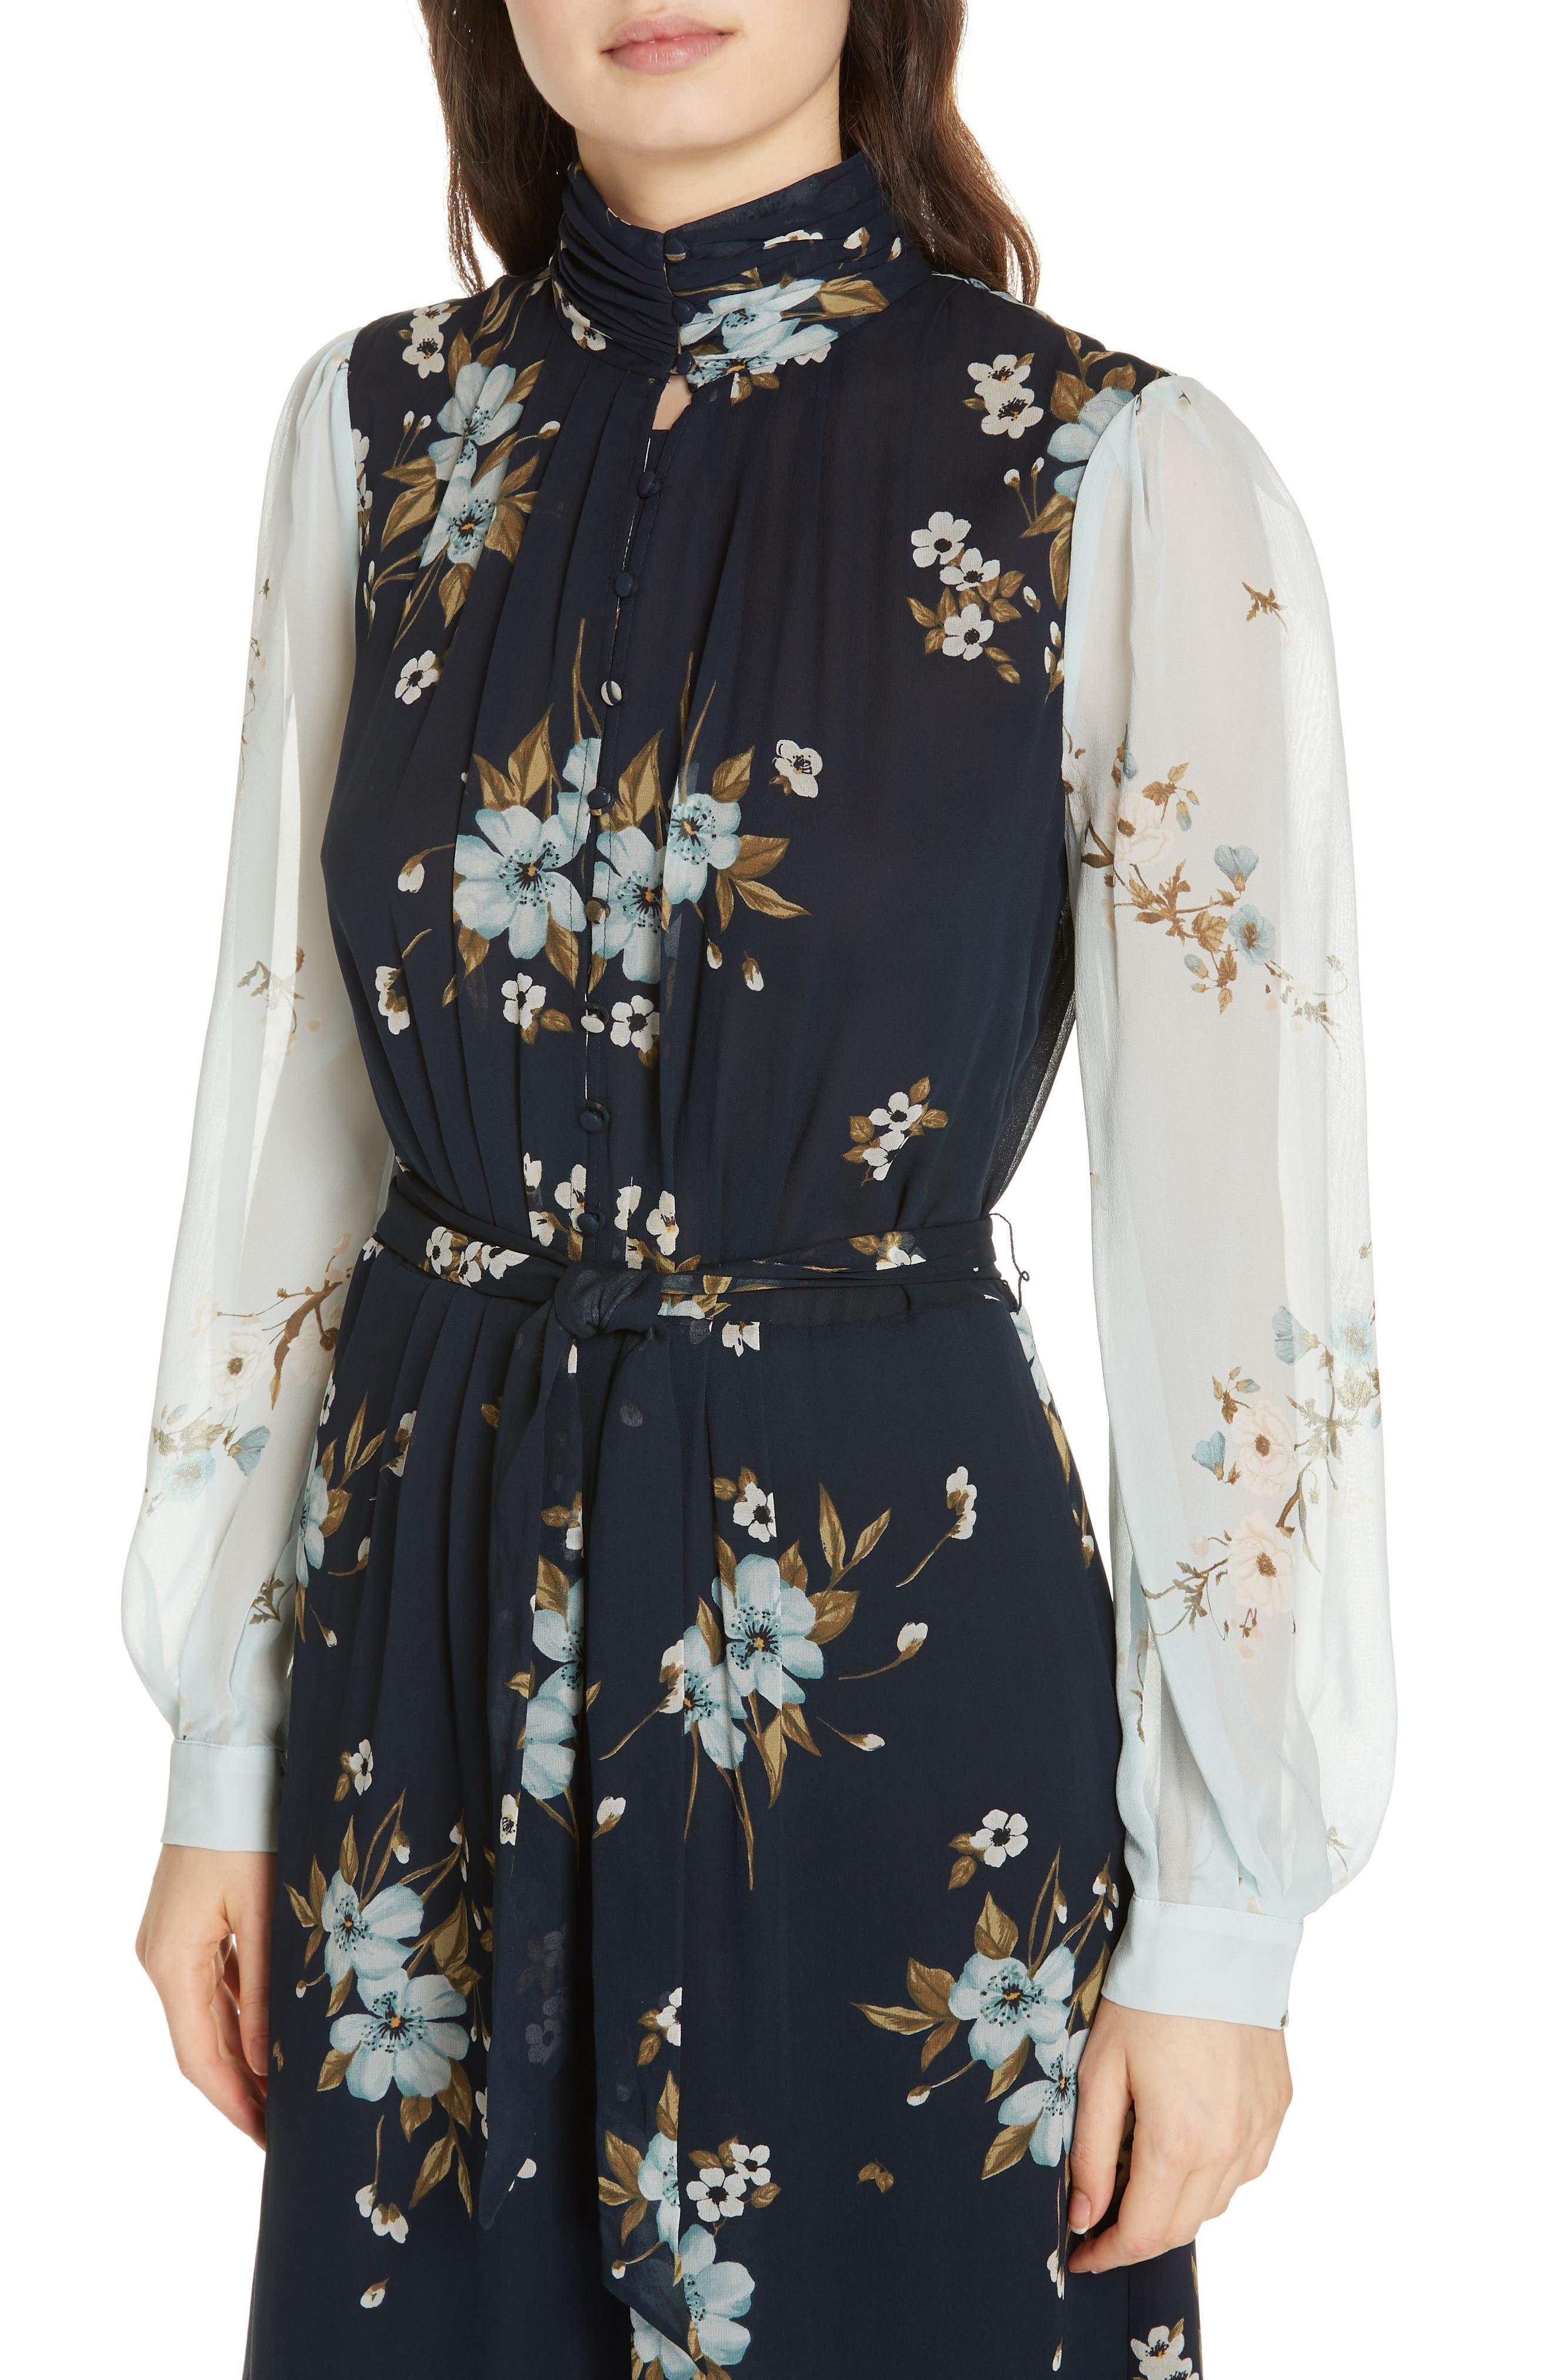 JOIE, Abbryana Silk Chiffon High Neck Dress, Alternate thumbnail 5, color, 440